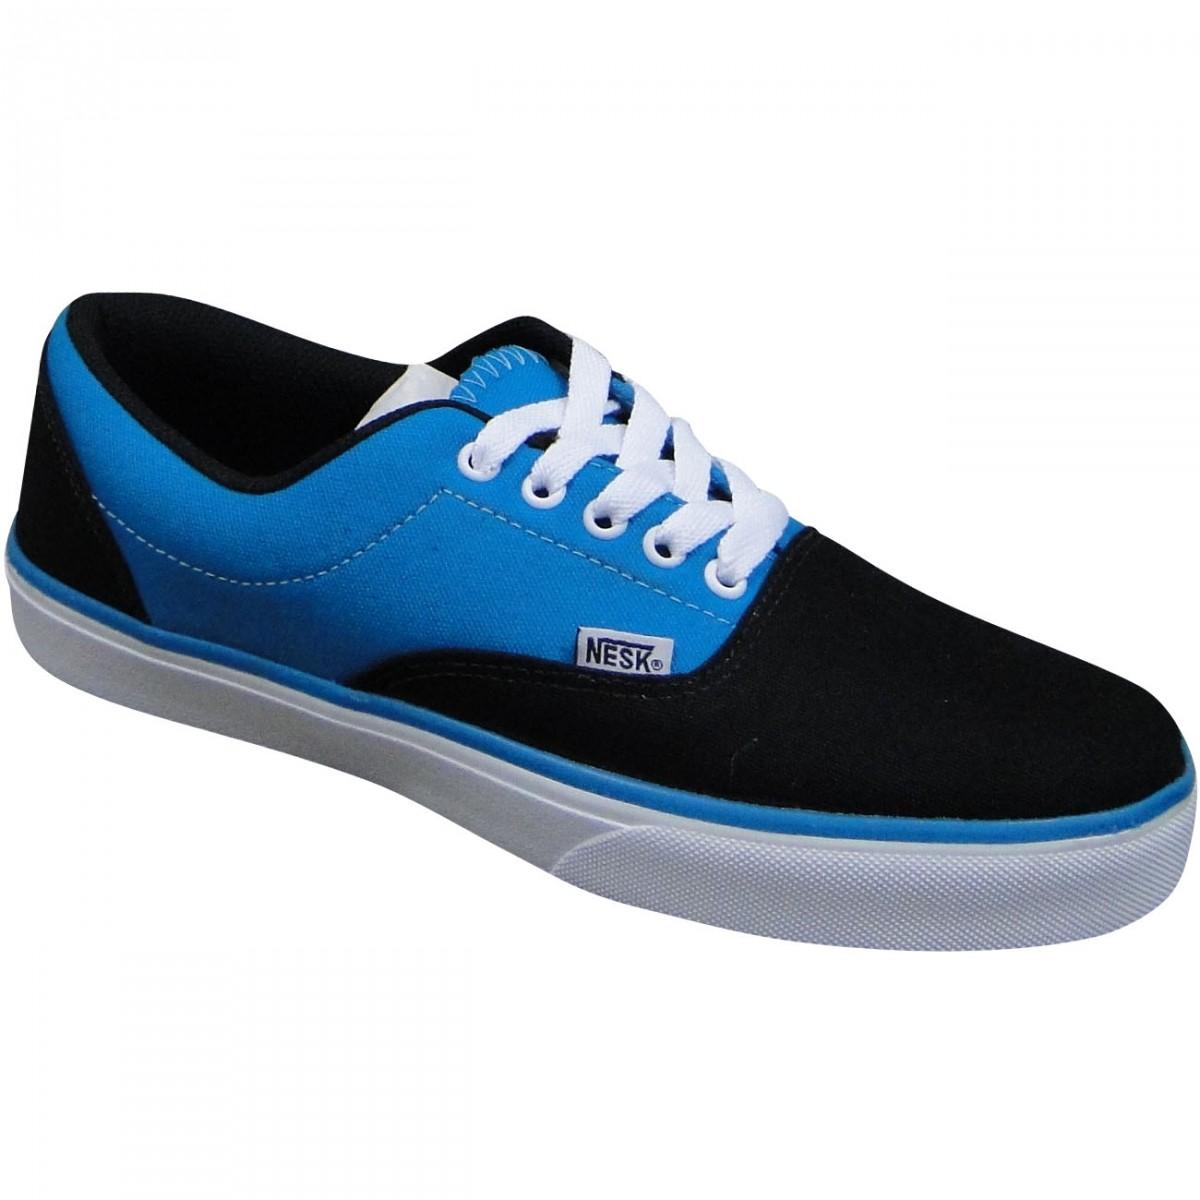 0b9cc46fdd7 Tenis Nesk Curvelo 012SE 418 - Preto Menta - Chuteira Nike